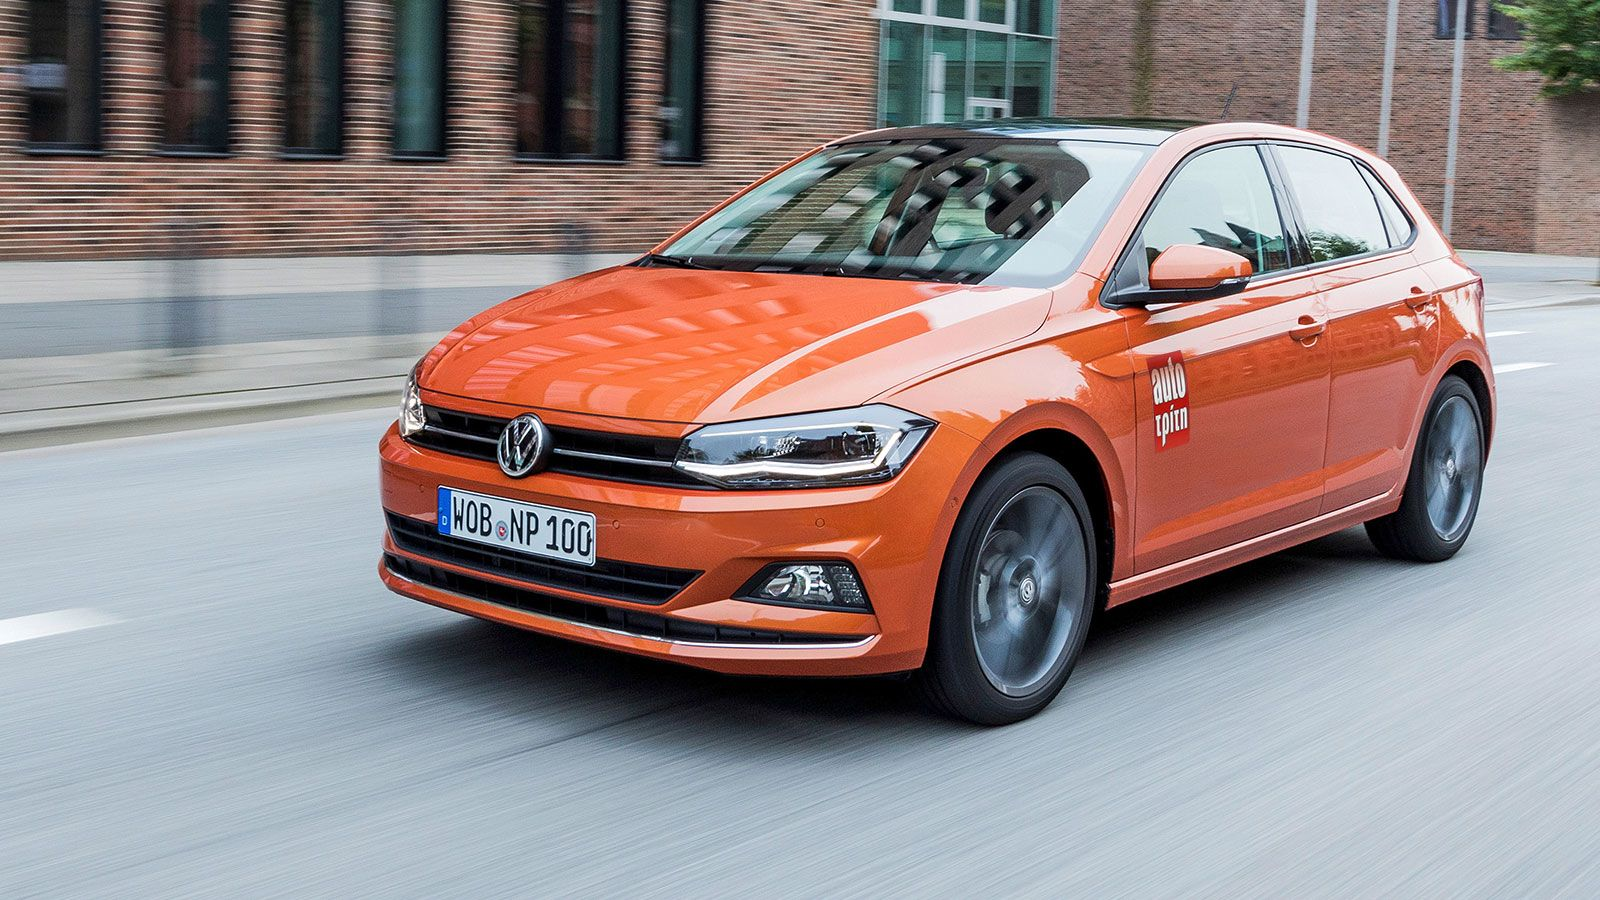 359e8b7c6230 Ανακοινώθηκαν επίσημα οι τιμές του νέου VW Polo